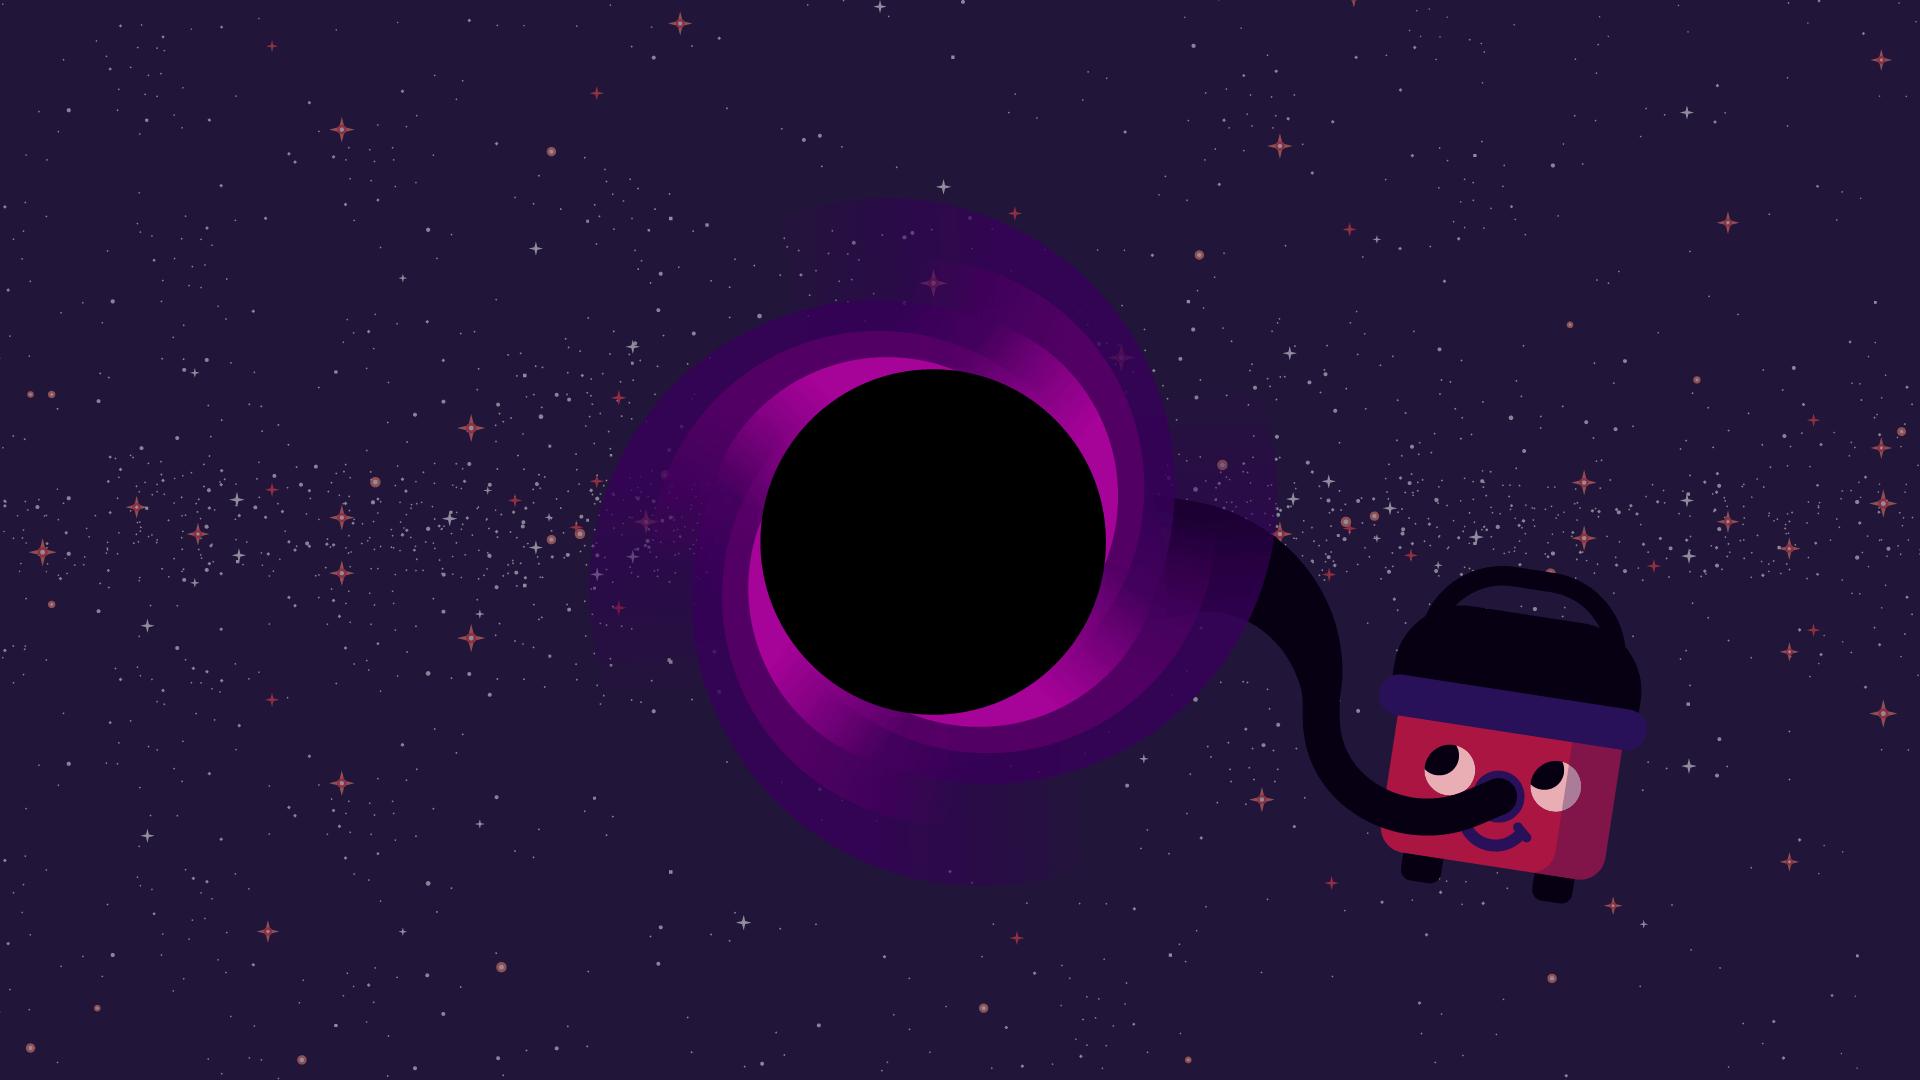 080_Website Project Black Holes_Kurzgesagt Project Pic 10